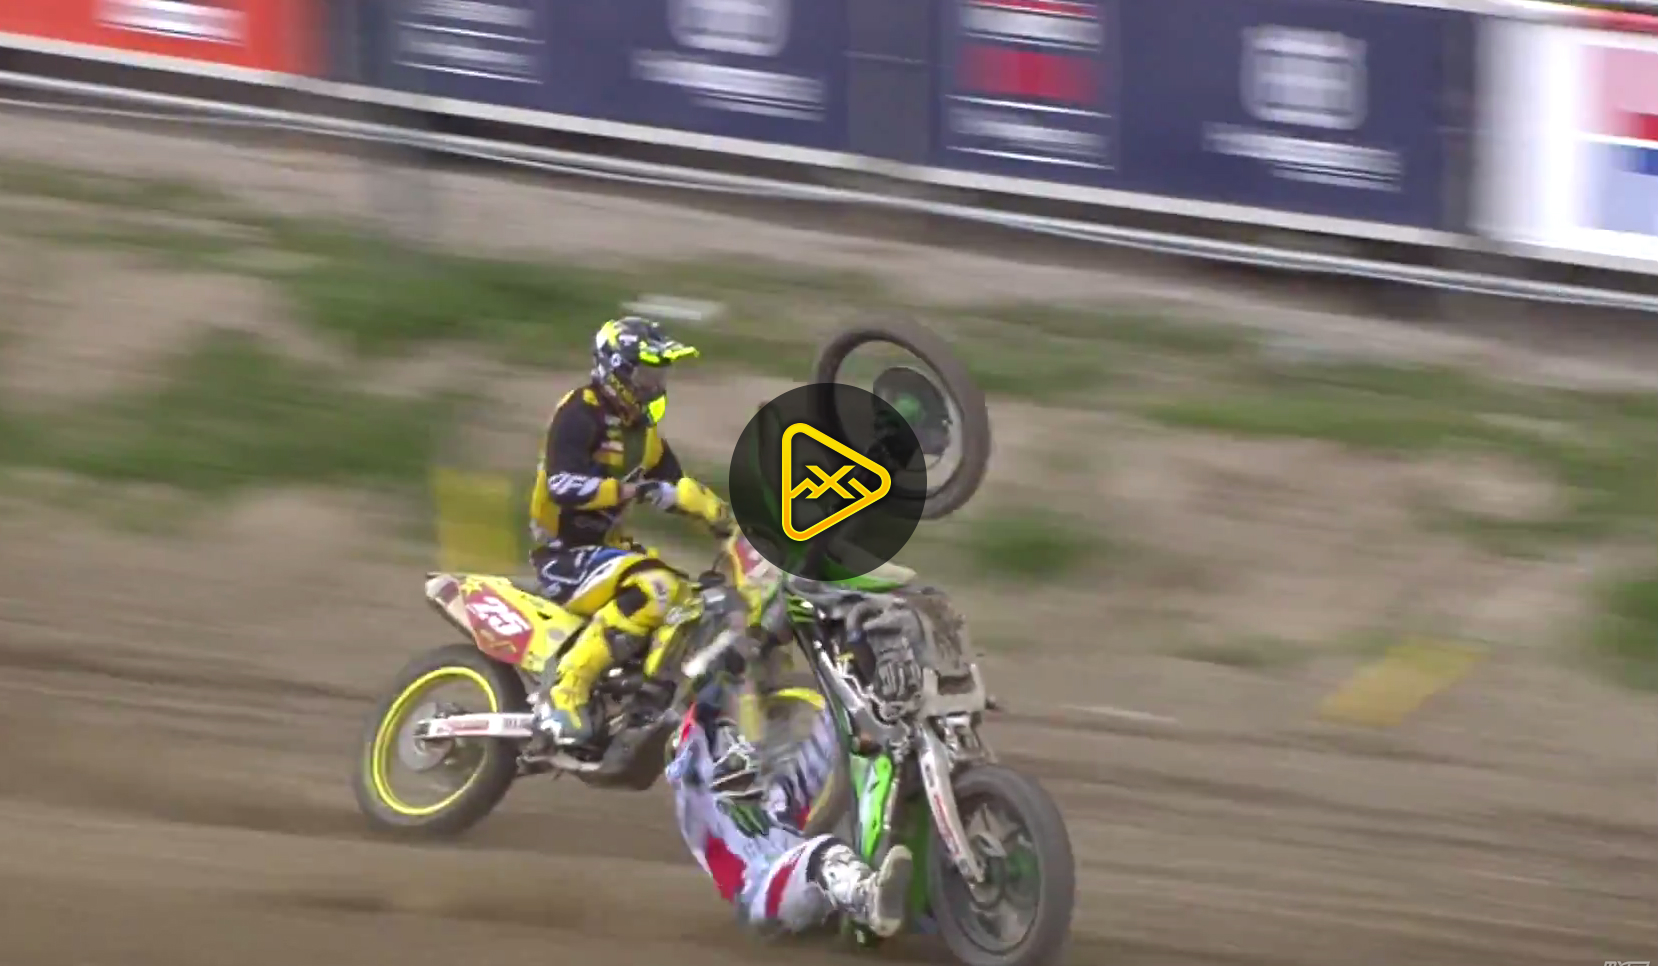 Ryan Villopoto Crash – Moto 2 at 2015 MXGP of Trentino